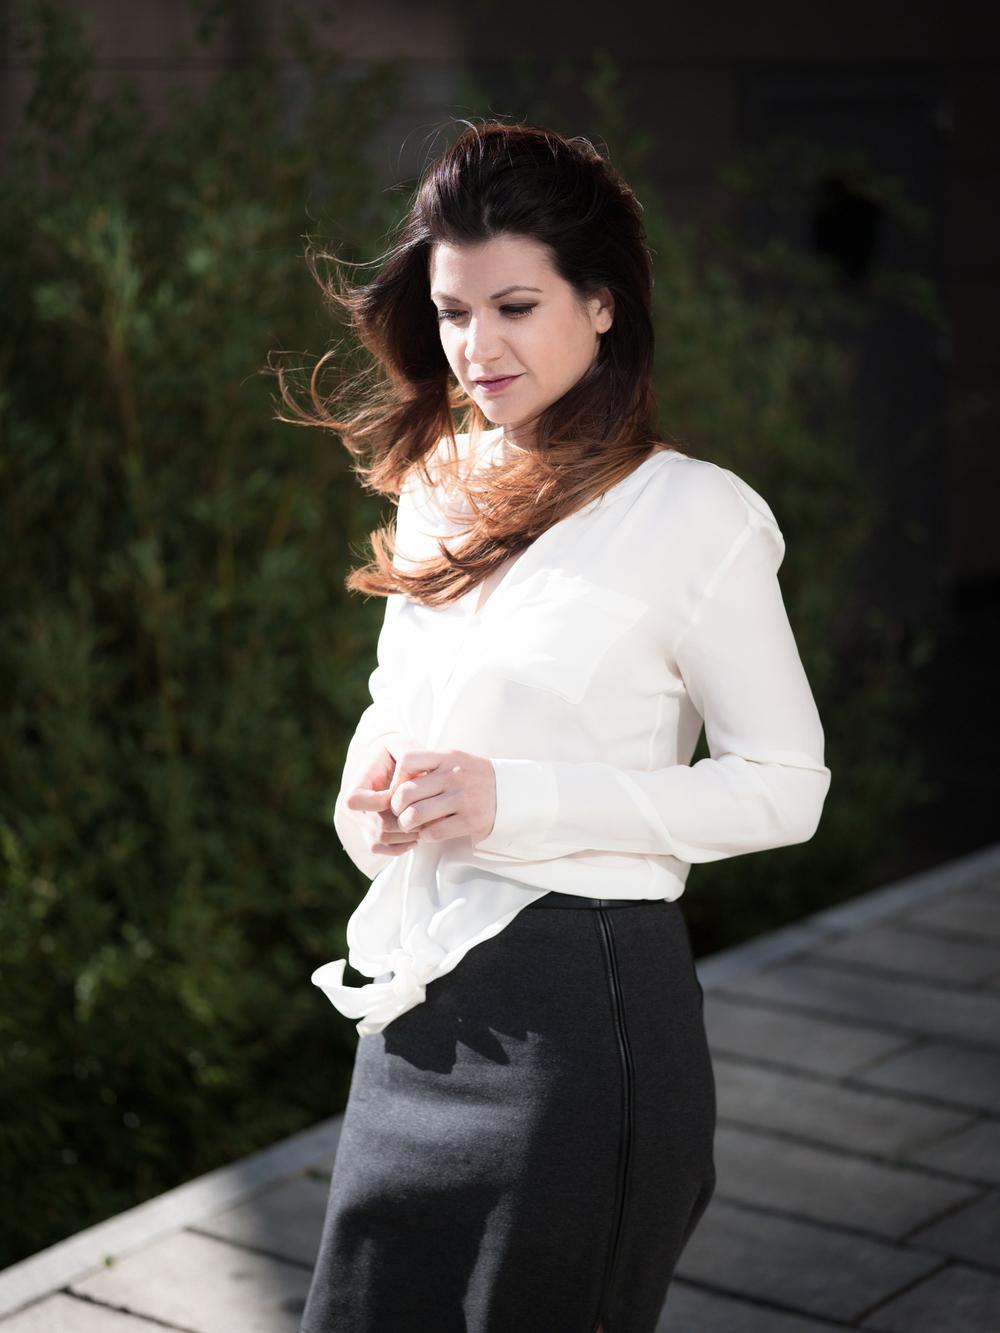 Julia Rosa Stockl